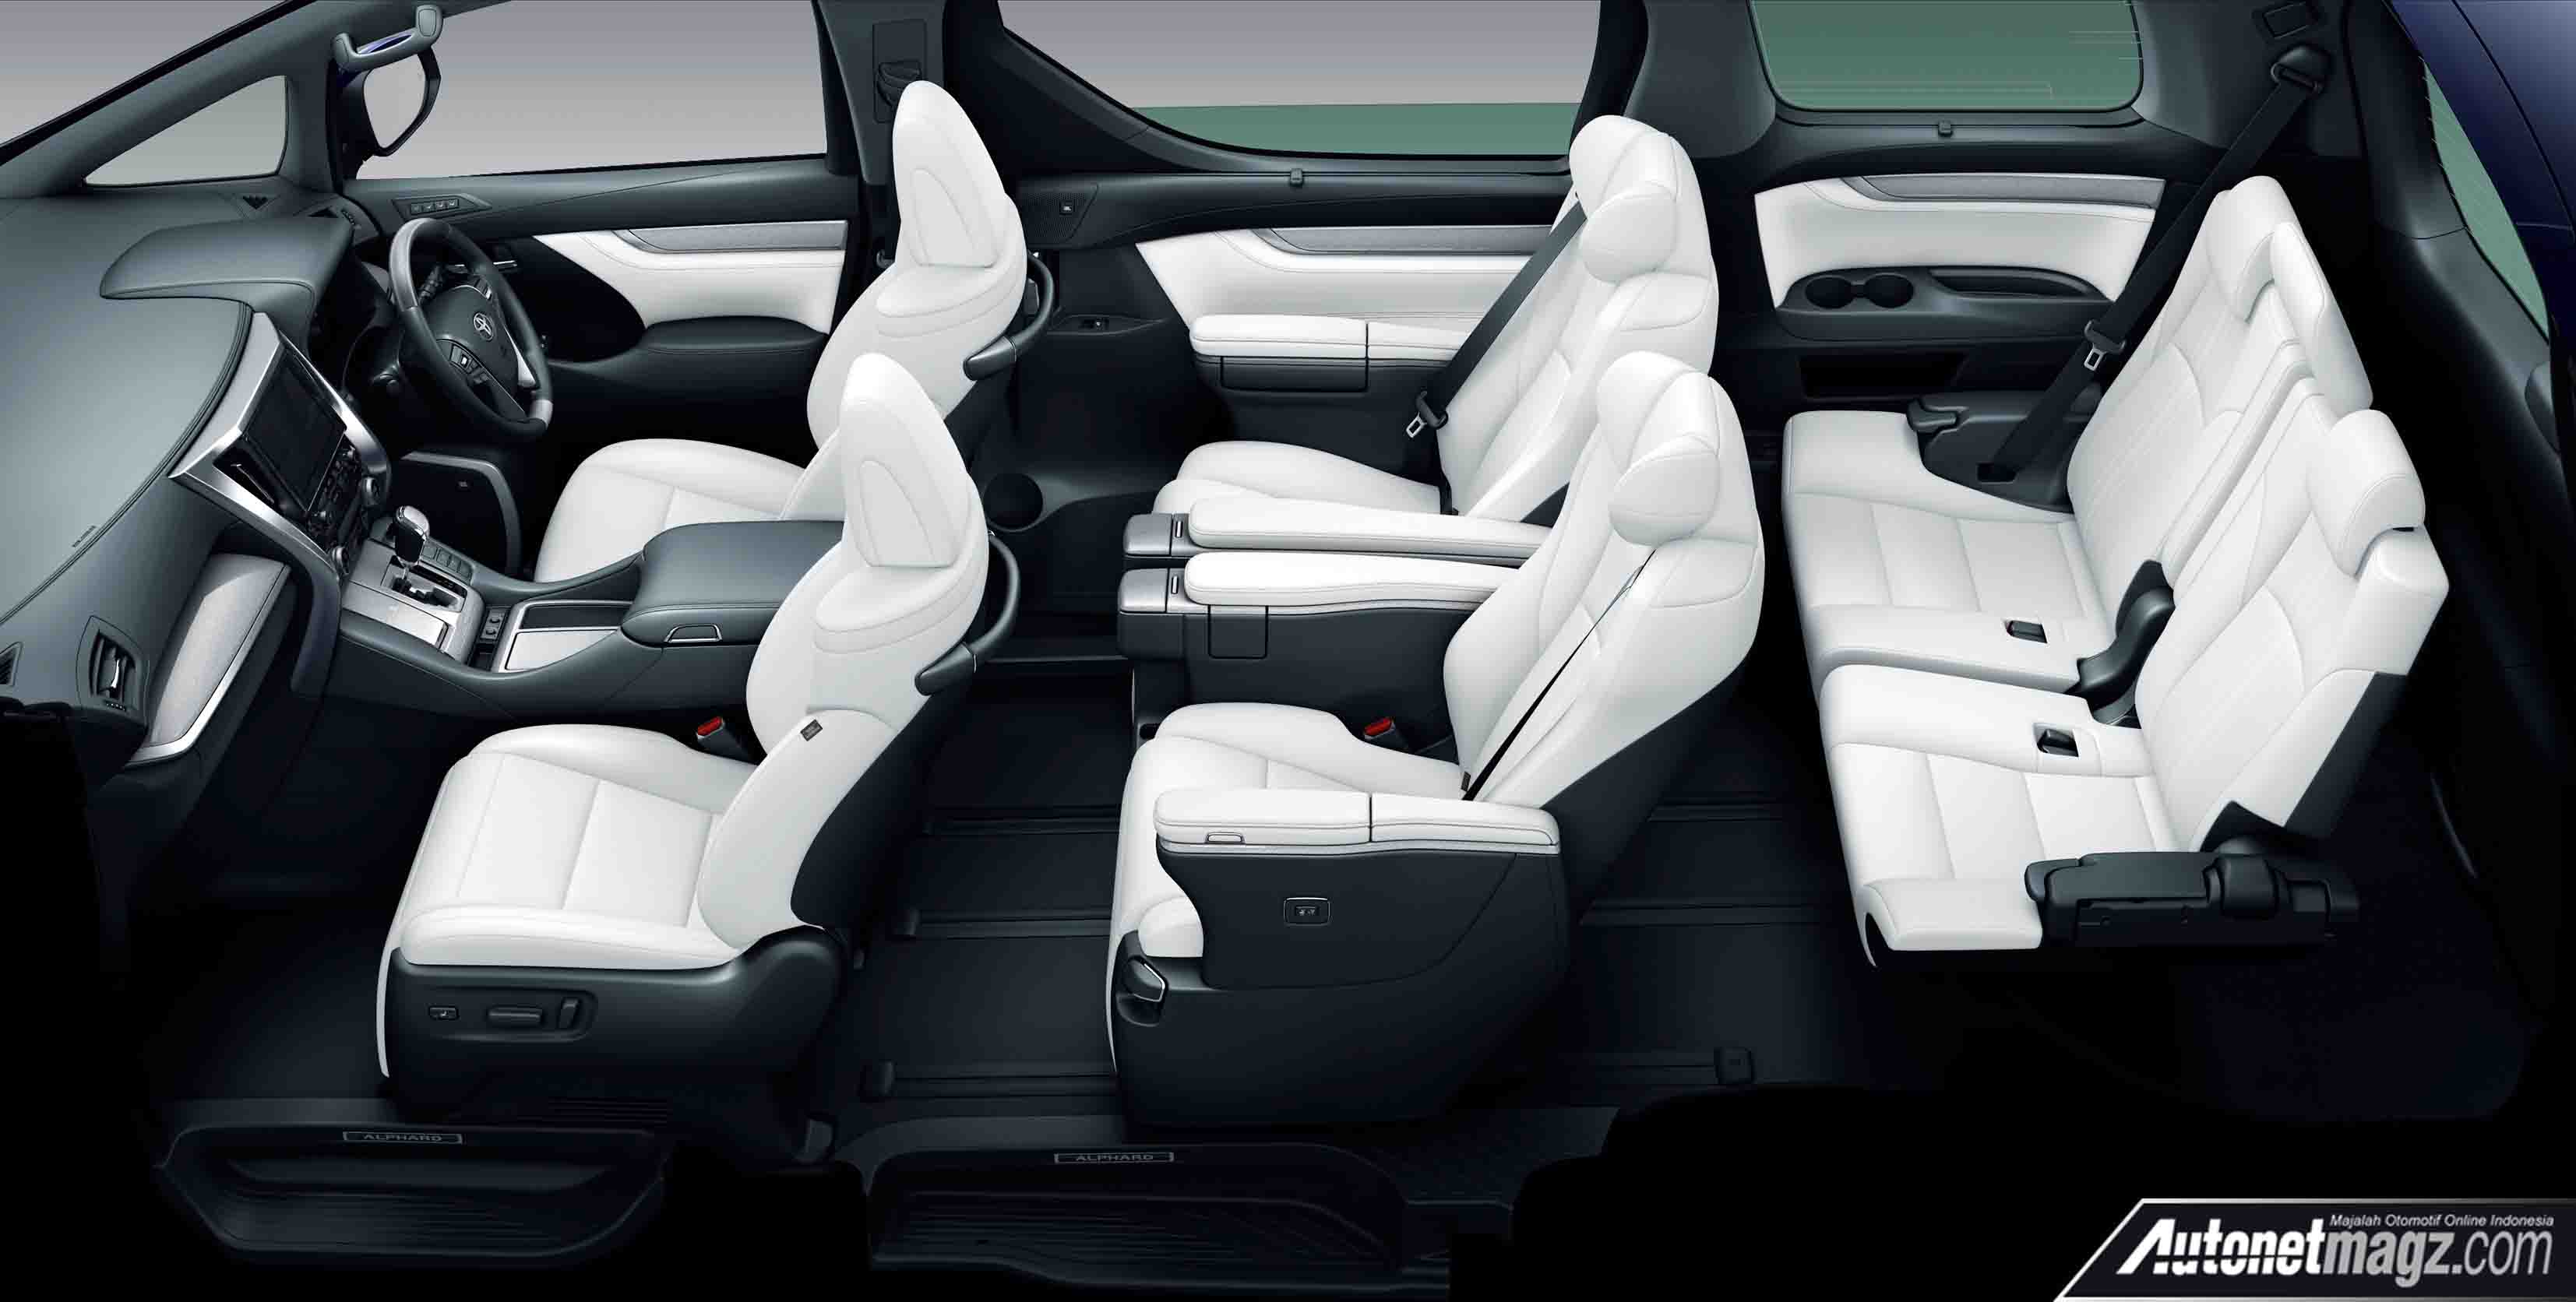 Interior Nappa White Toyota Alphard Vellfire Facelift 2018 Autonetmagz Review Mobil Dan Motor Baru Indonesia